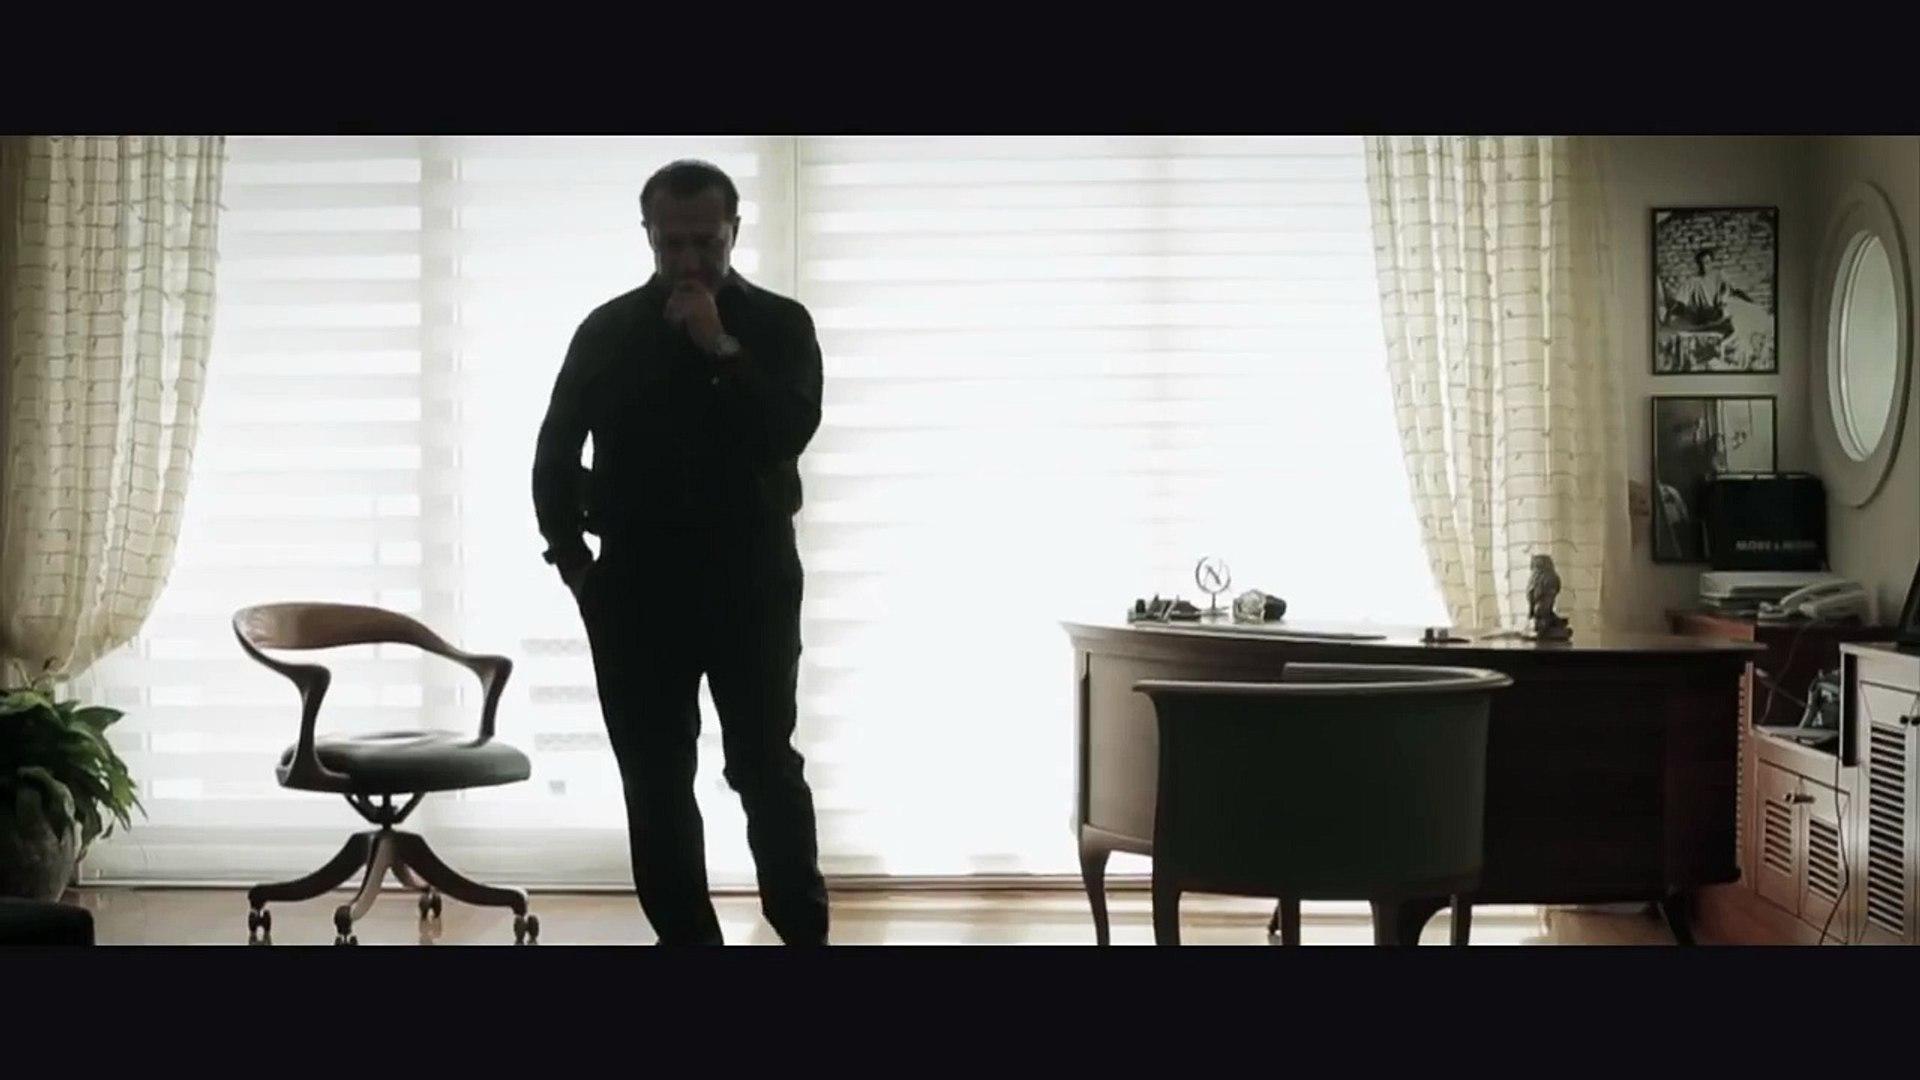 Sasa - Λευτέρης Πανταζής - Αντι-άπιστος - Official Video Clip